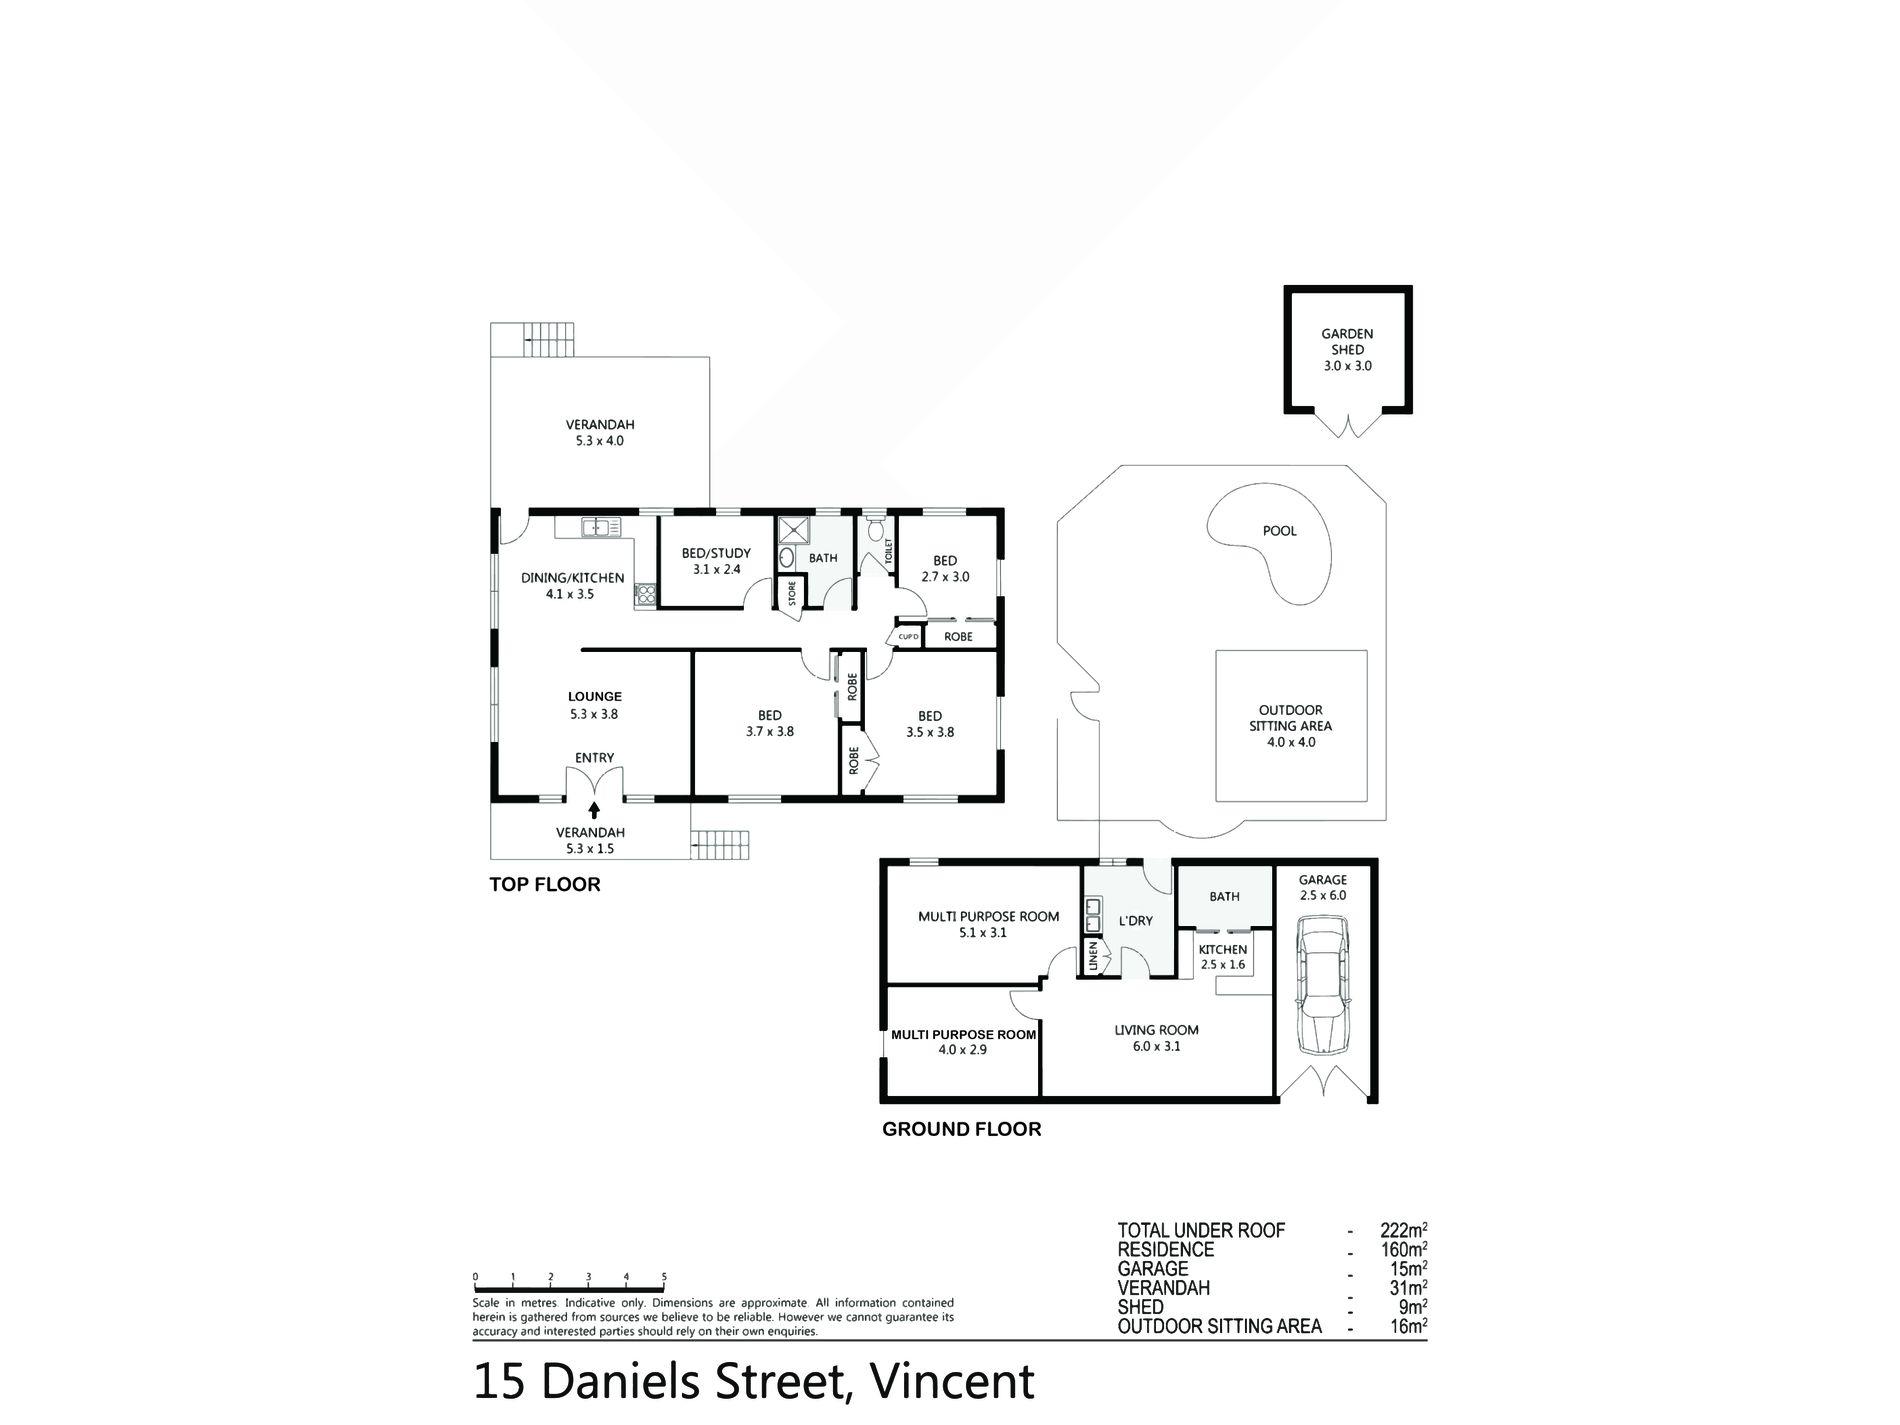 15 Daniels Street, Vincent